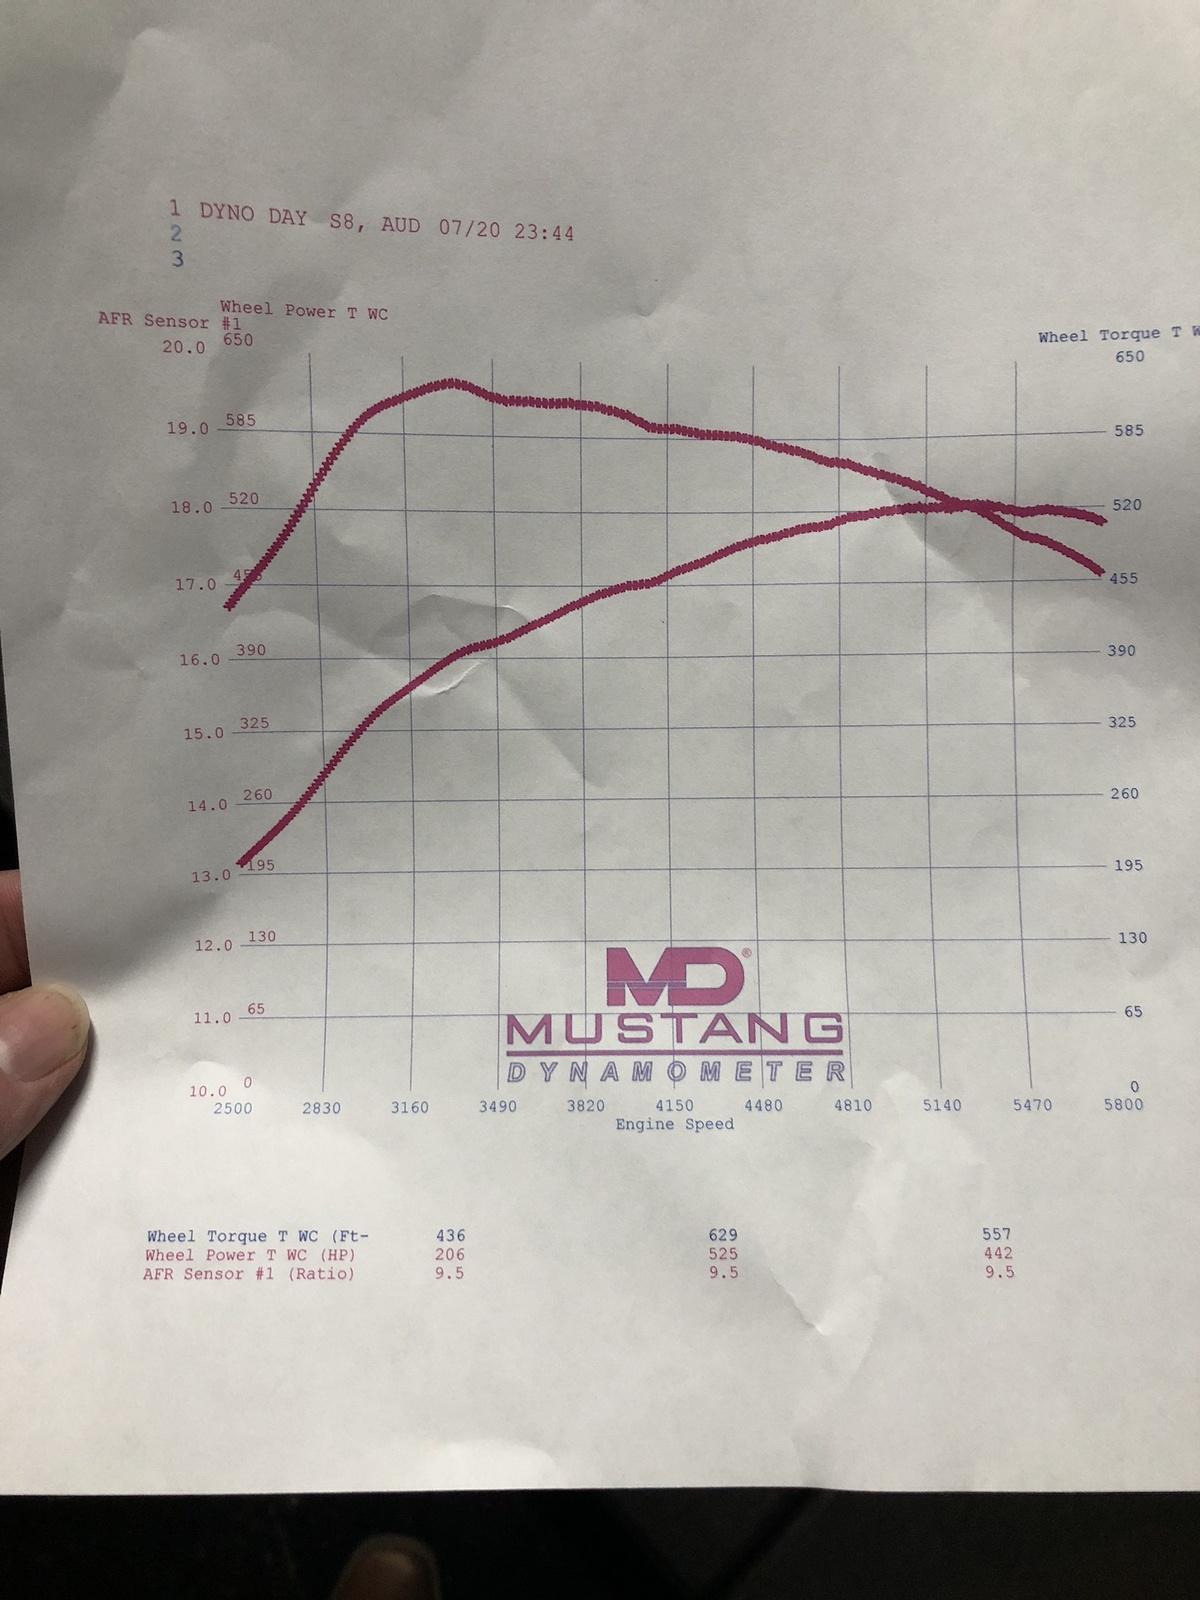 Audi A8 Dyno Graph Results